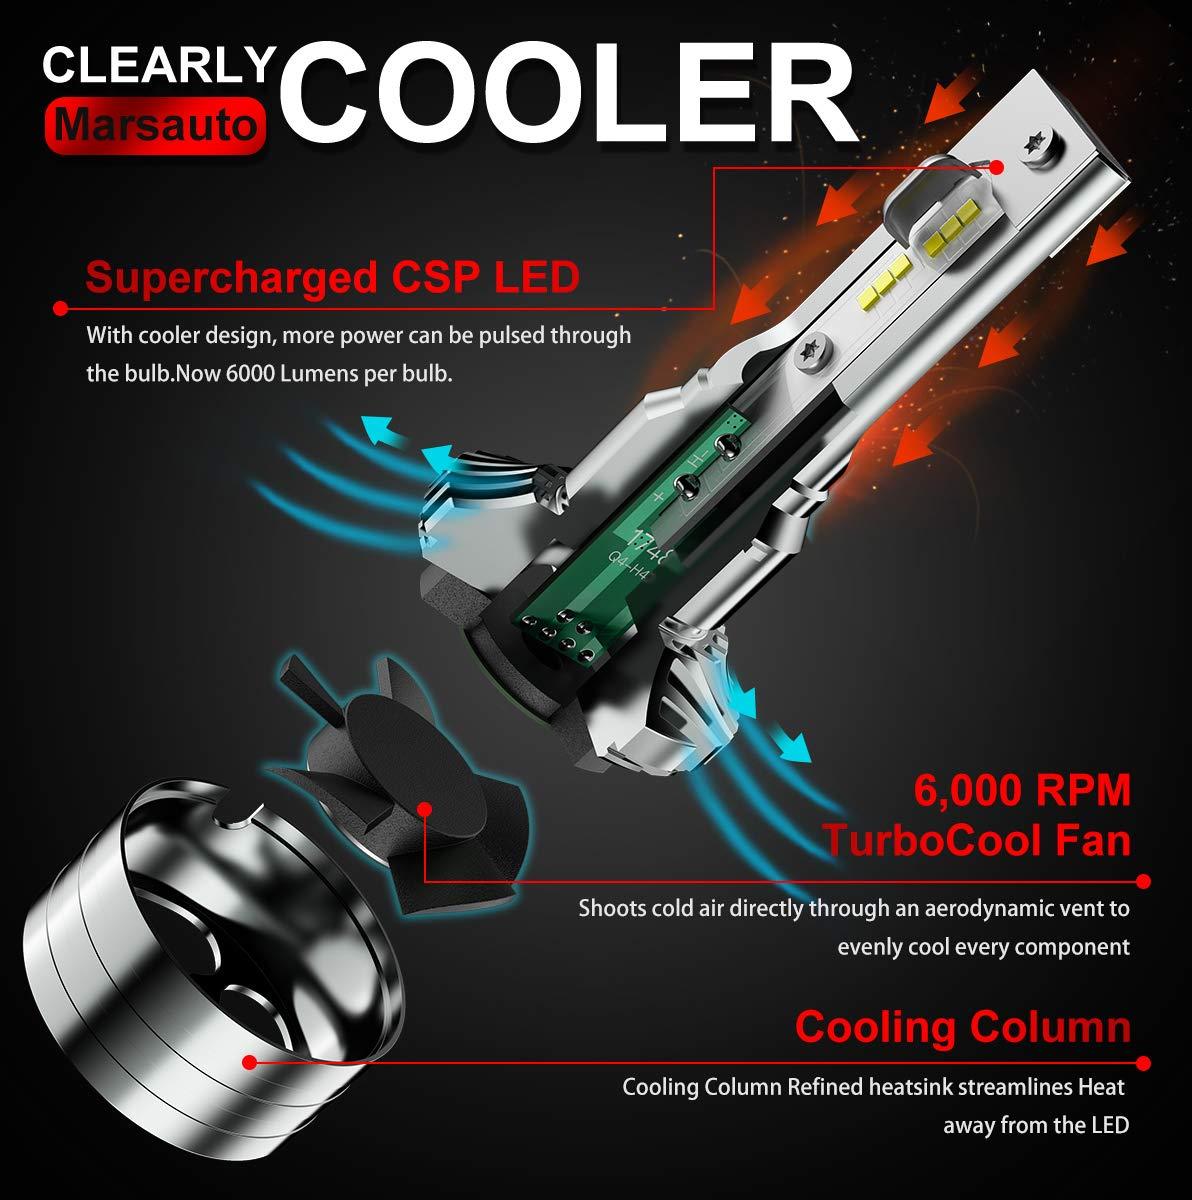 Amazon.com: 9003/H4 Led Motorcycle Headlight Bulb, Marsauto Hi/Lo Beam Conversion Kit Halogen Replacement 6000K White 12V (Pack of 1): Automotive